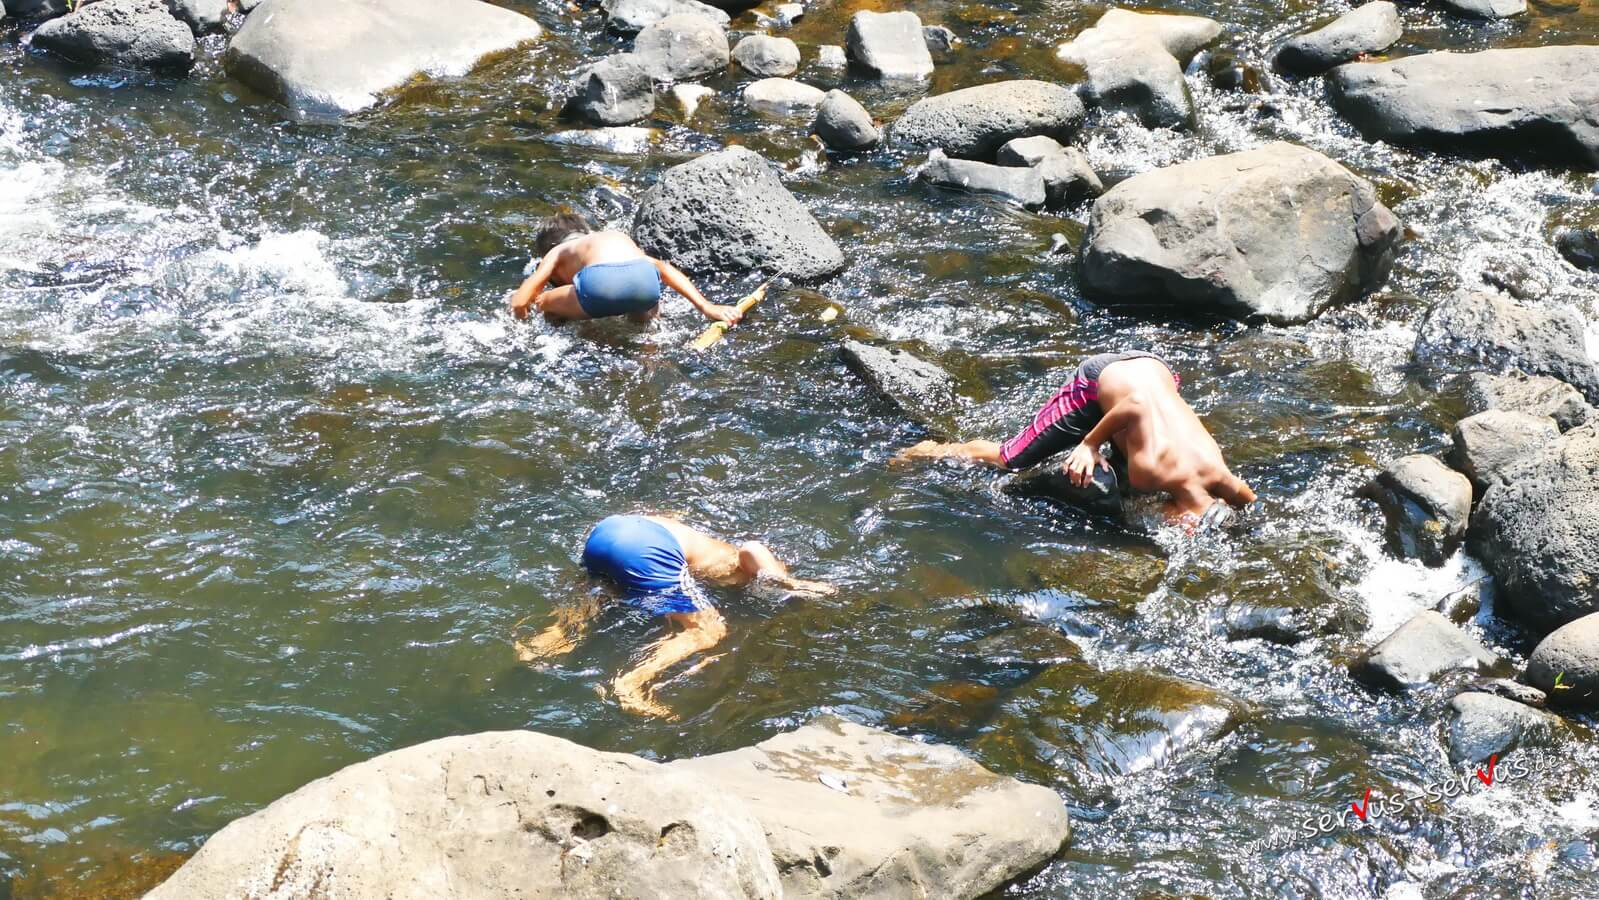 Kinder, Fischen, Laos Tat Yuang